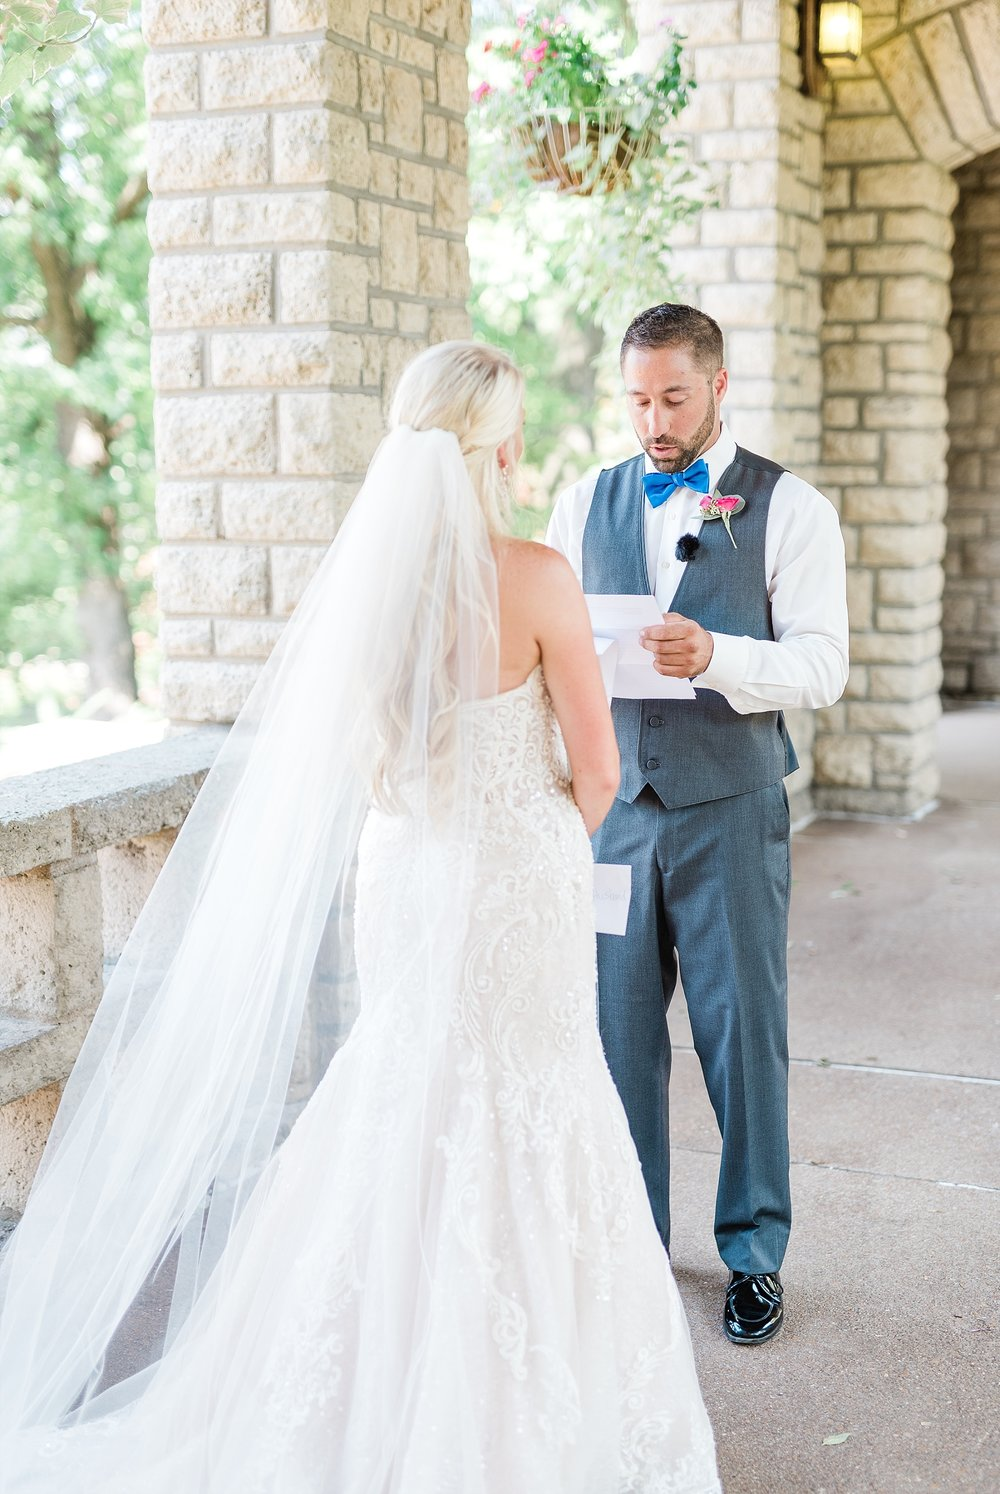 Alan and Heather Horn Wedding by Kelsi Kliethermes Photography Associate - Rachel_0039.jpg